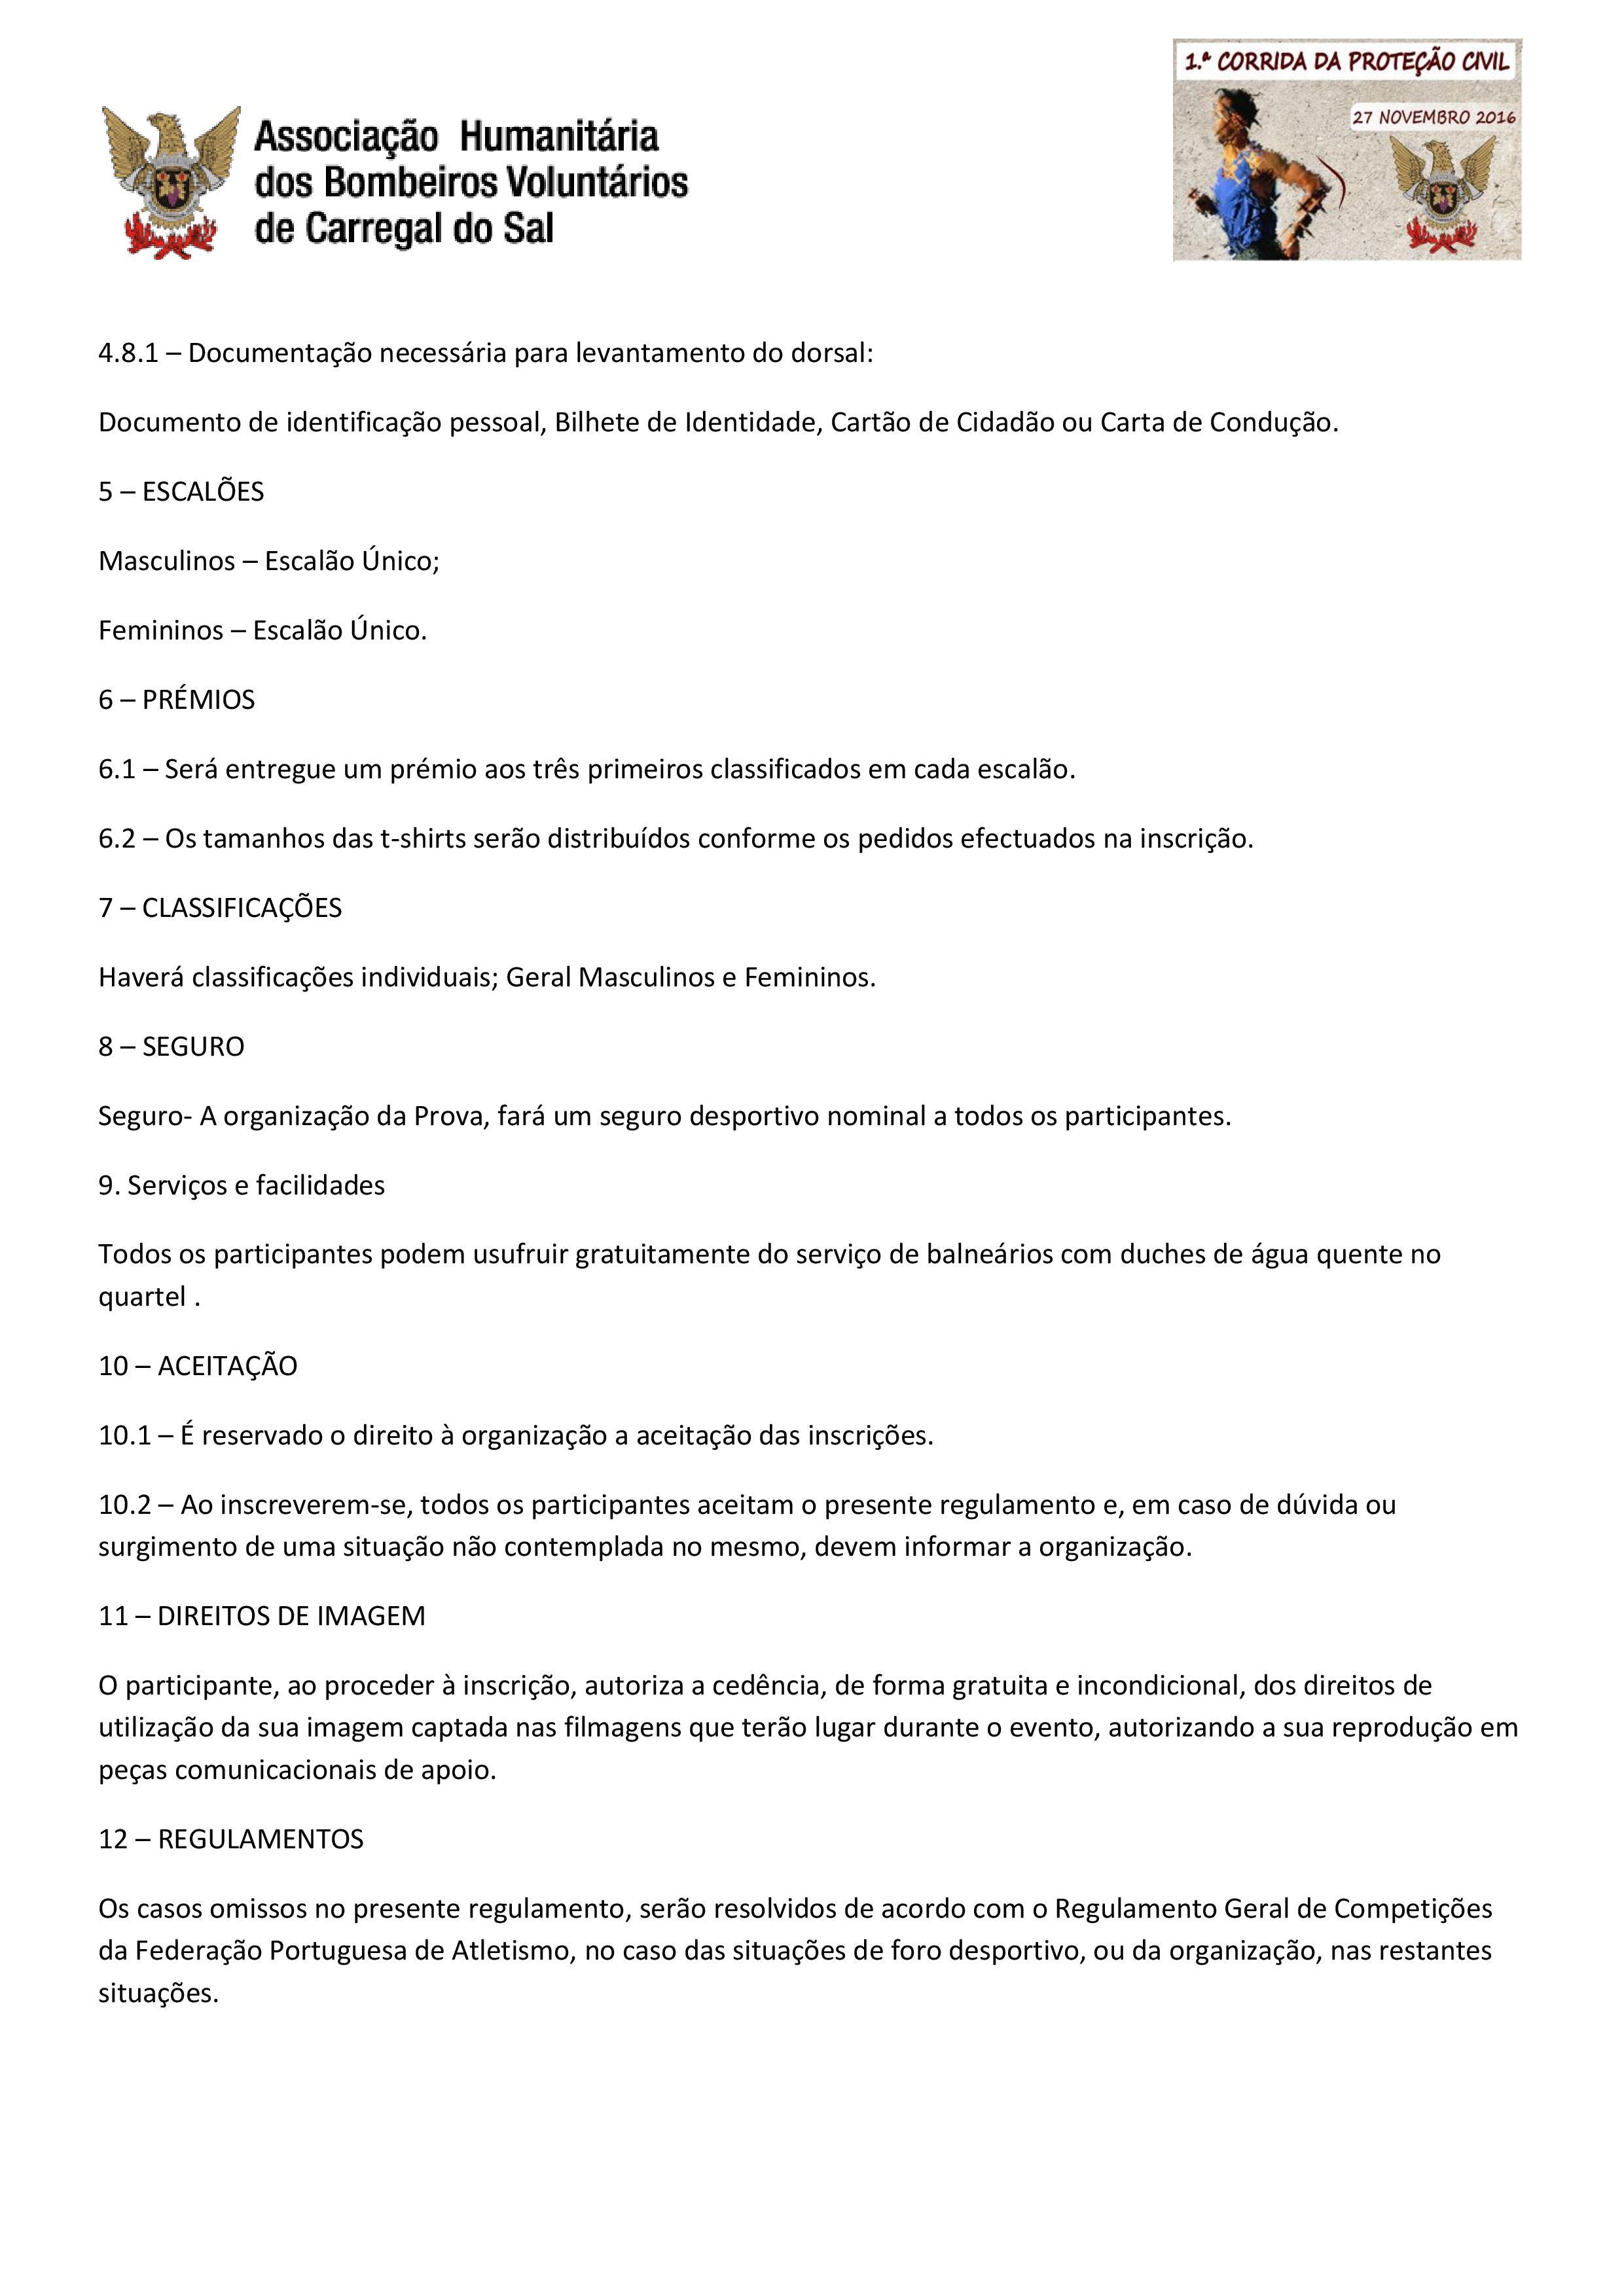 regulamento-1a-corrida-da-protecao-civil_bvcs_final-page-002